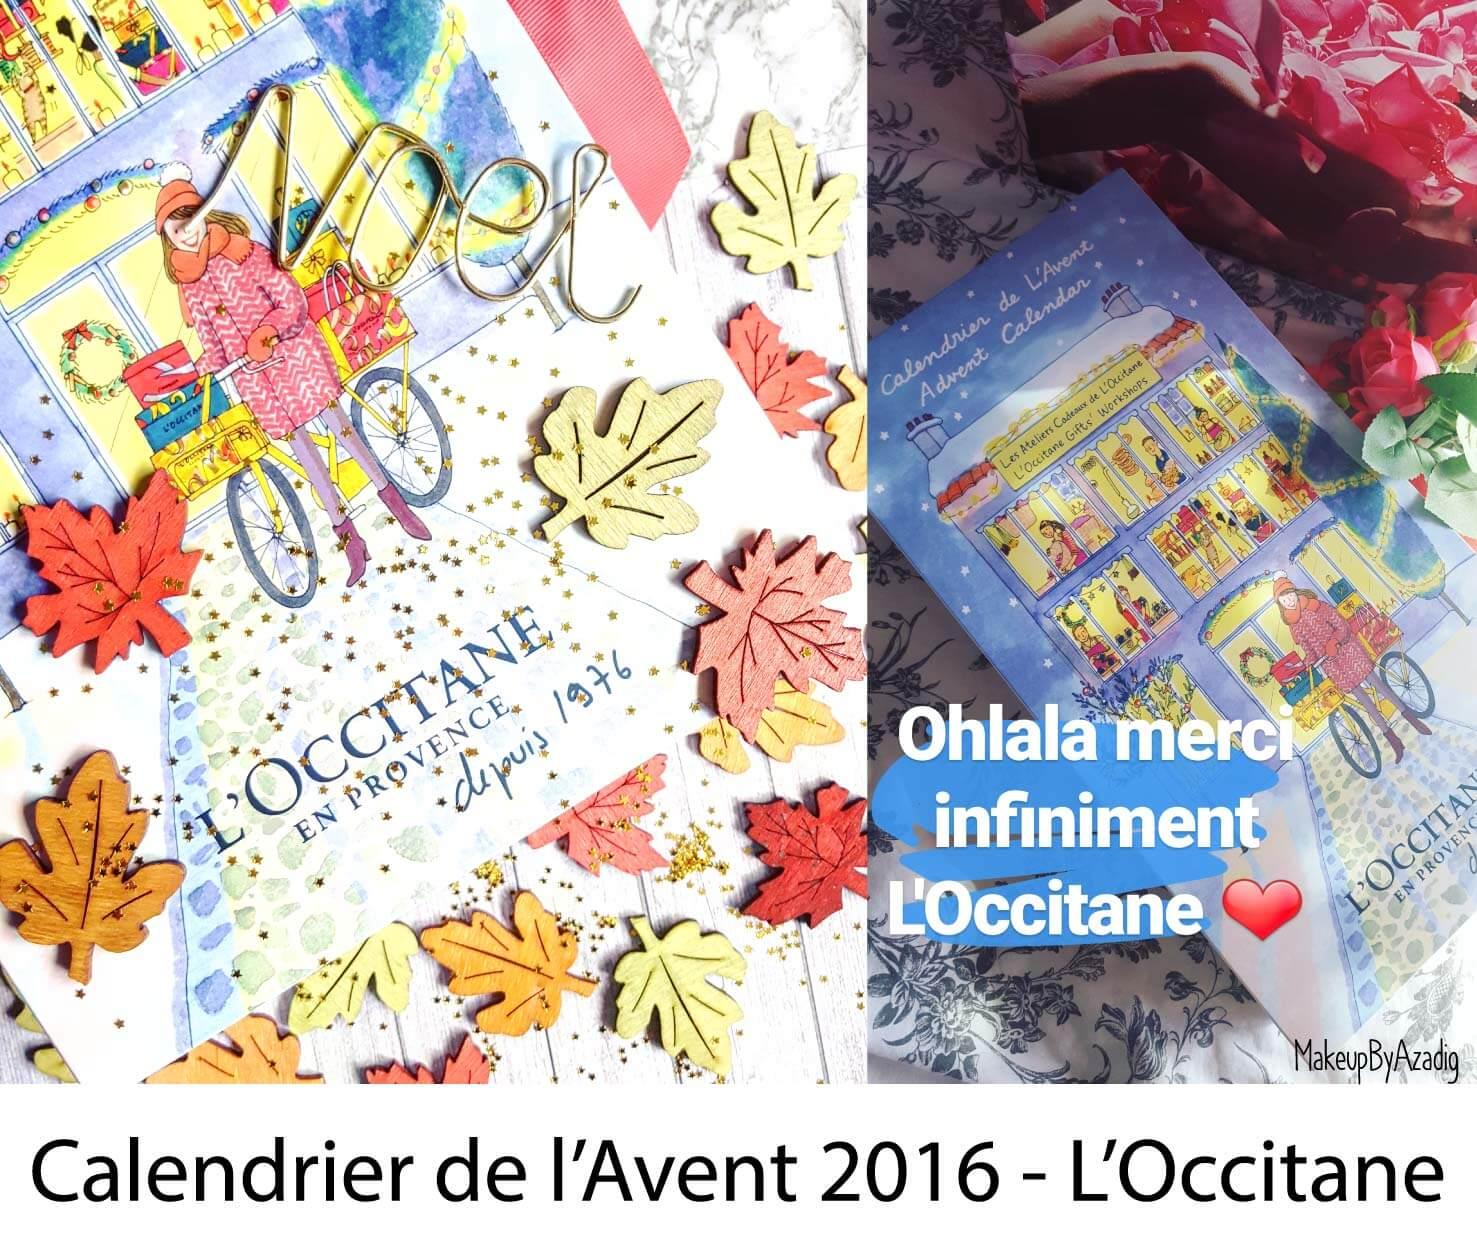 calendrier-de-lavent-loccitane-reservation-troyes-makeupbyazadig